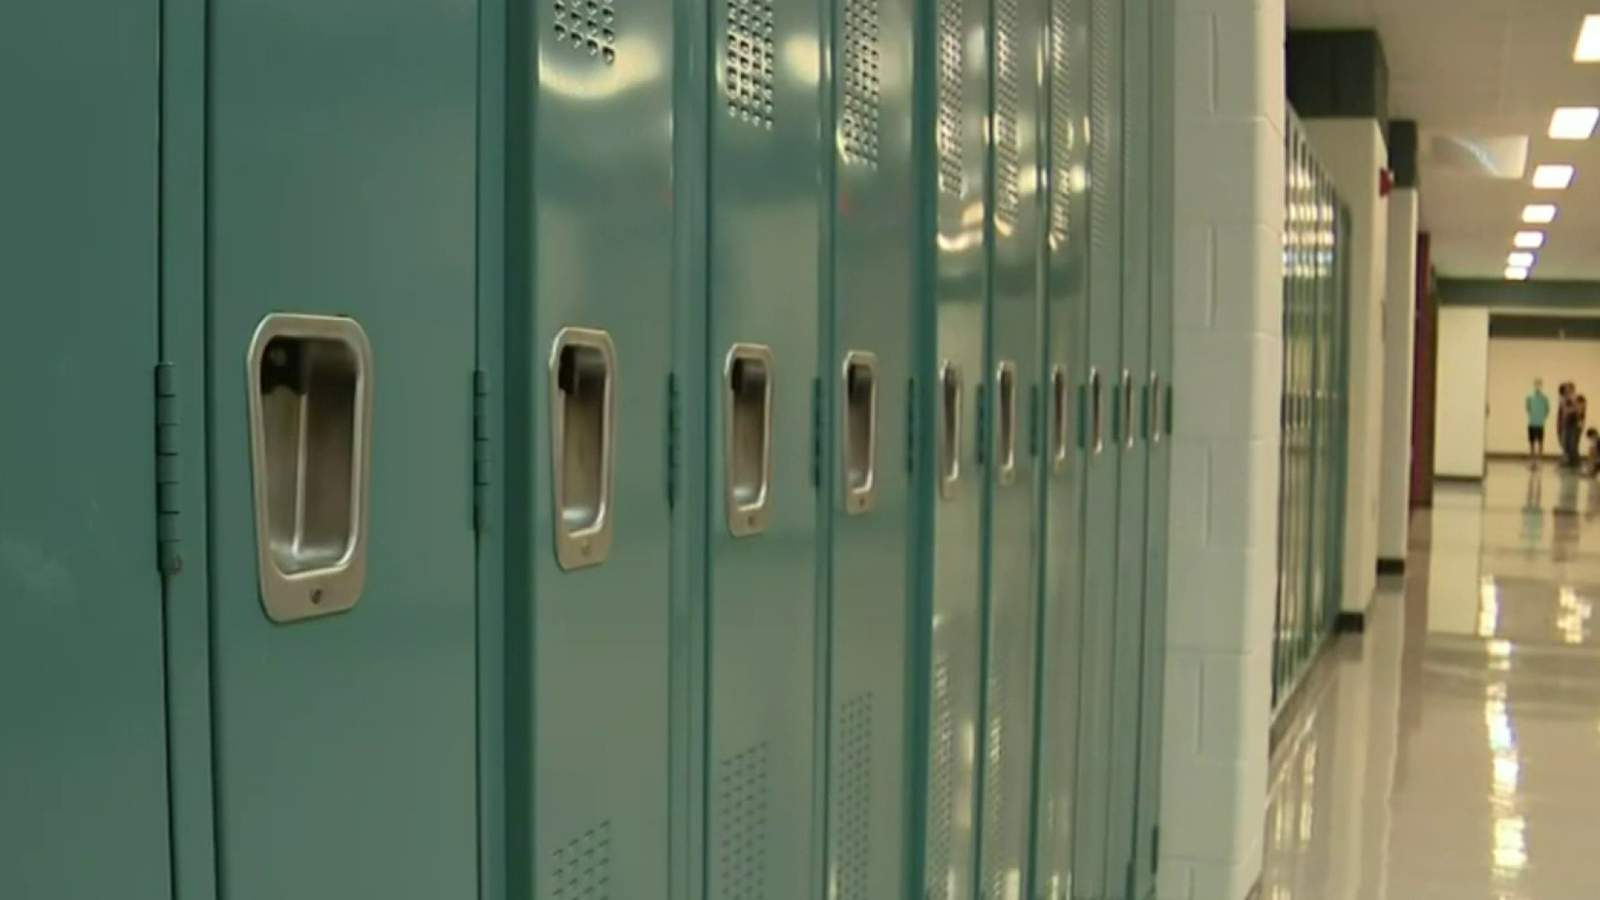 Detroit public schools, teachers union agree to 1 year contract